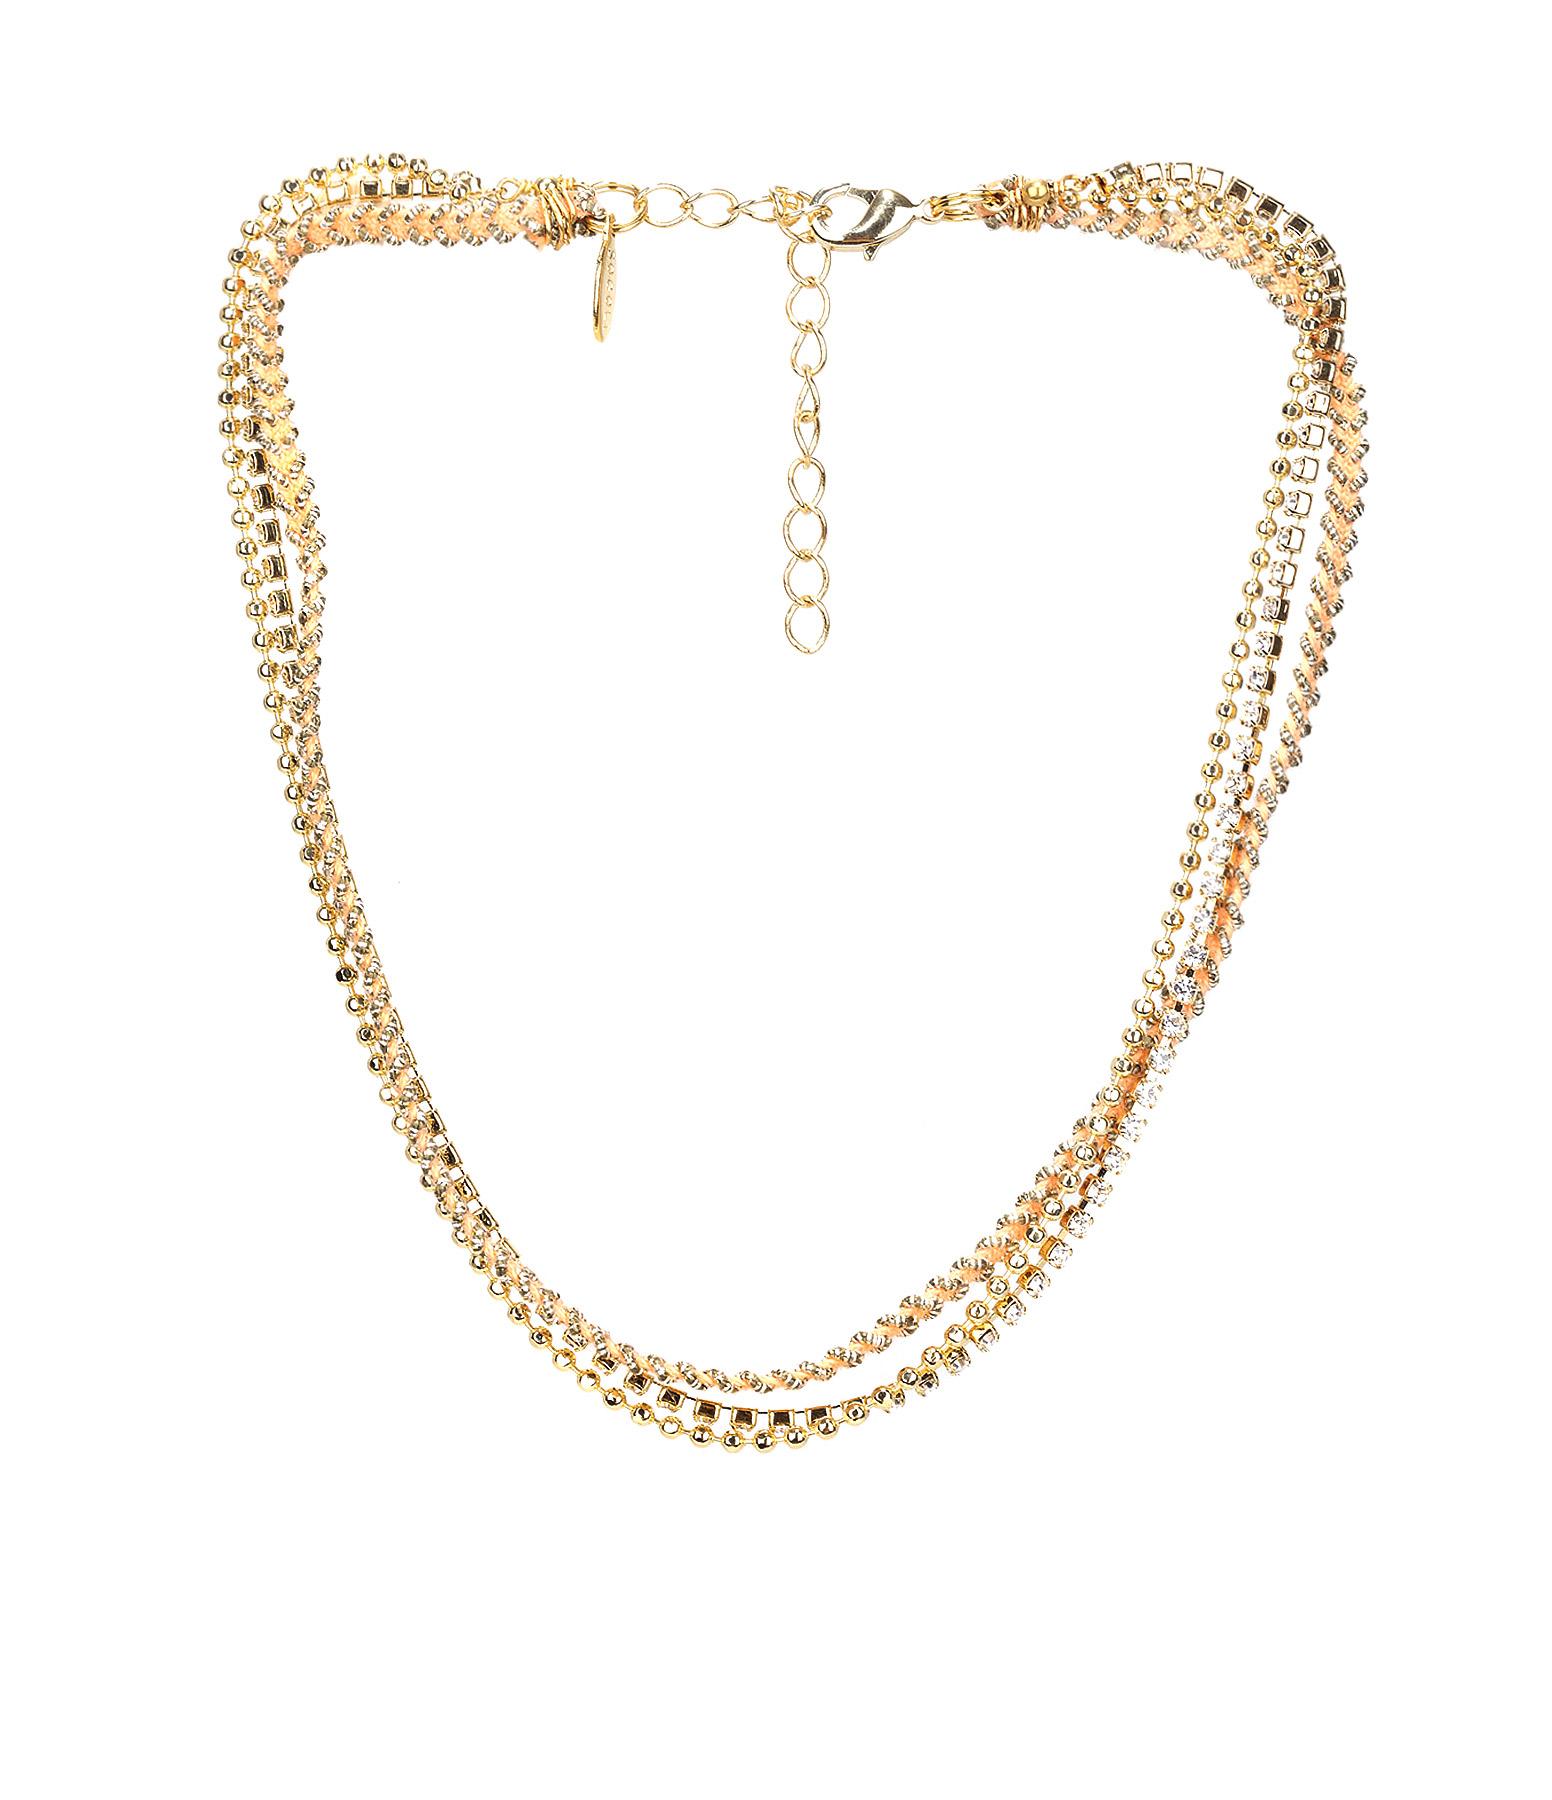 Collier / Bracelet 3 rangs Strass Pêche